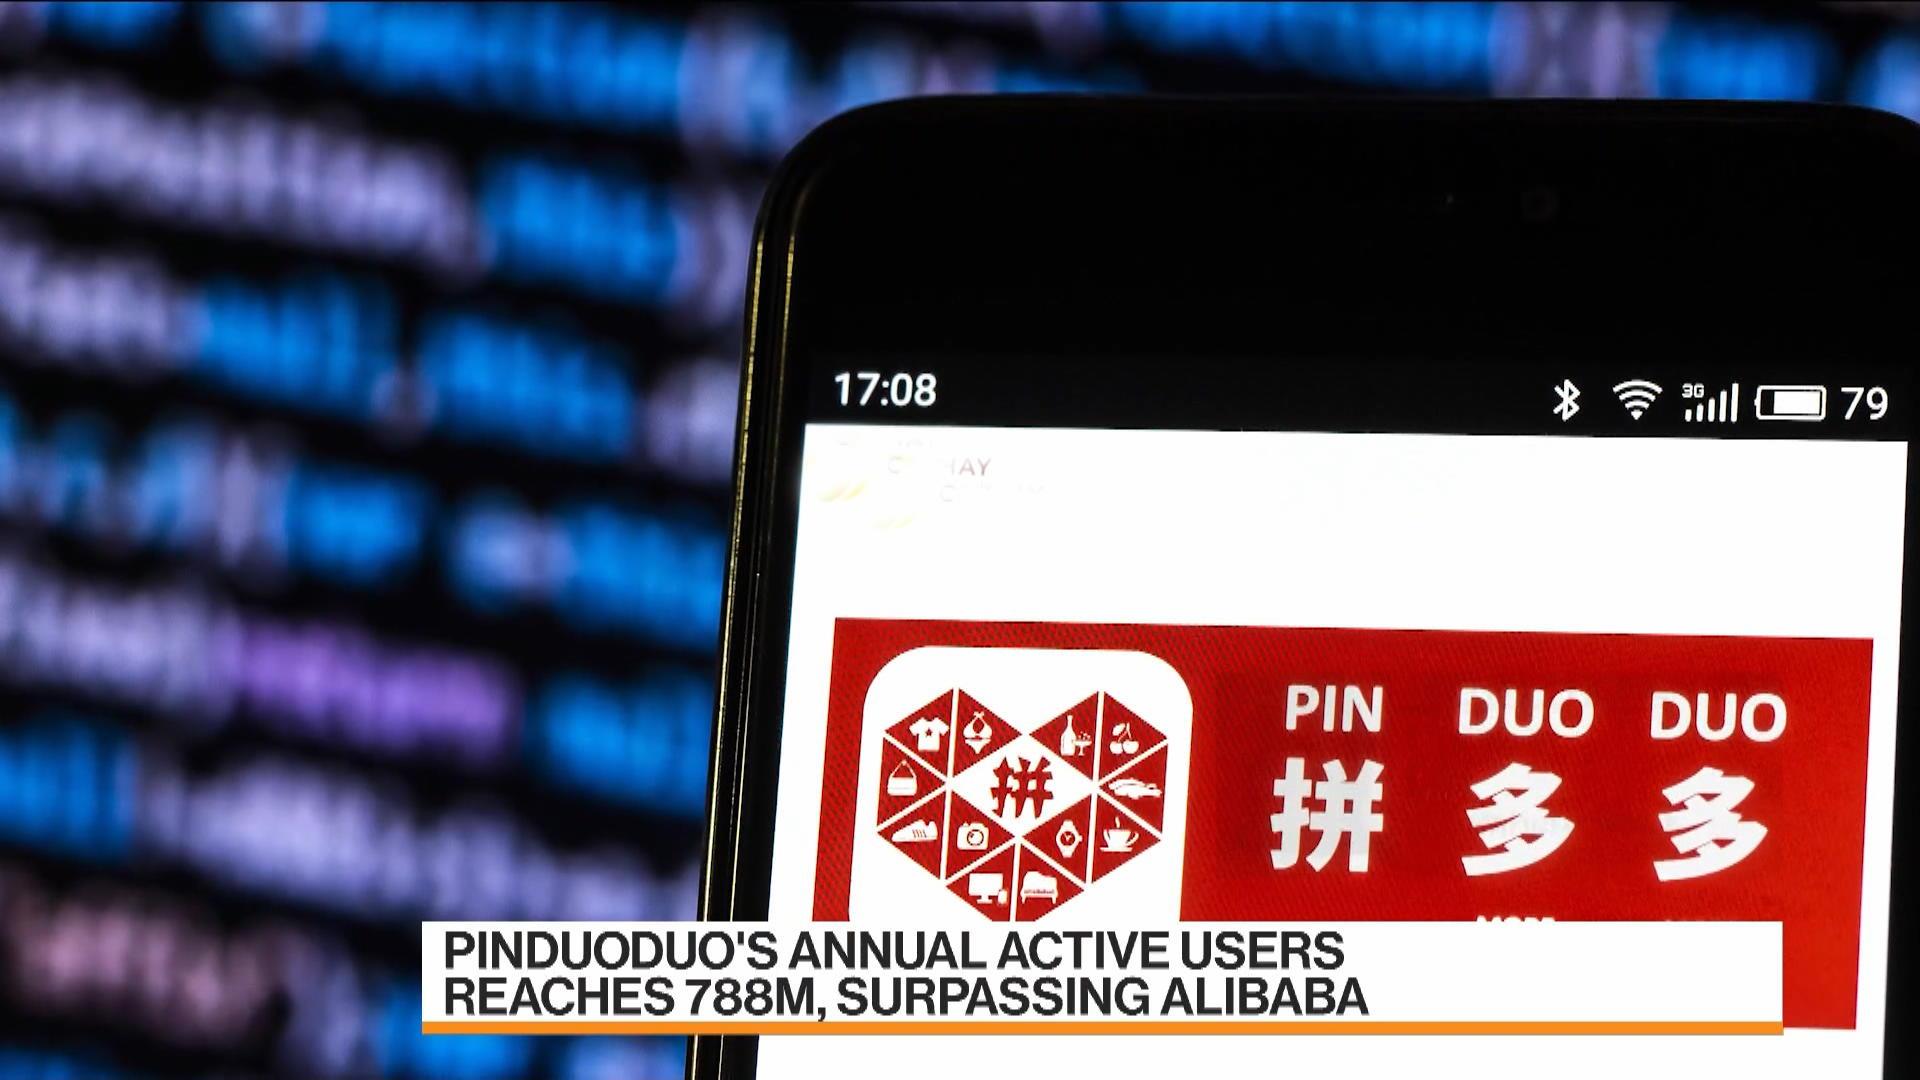 Pinduoduo's User Base Surpasses Alibaba's thumbnail